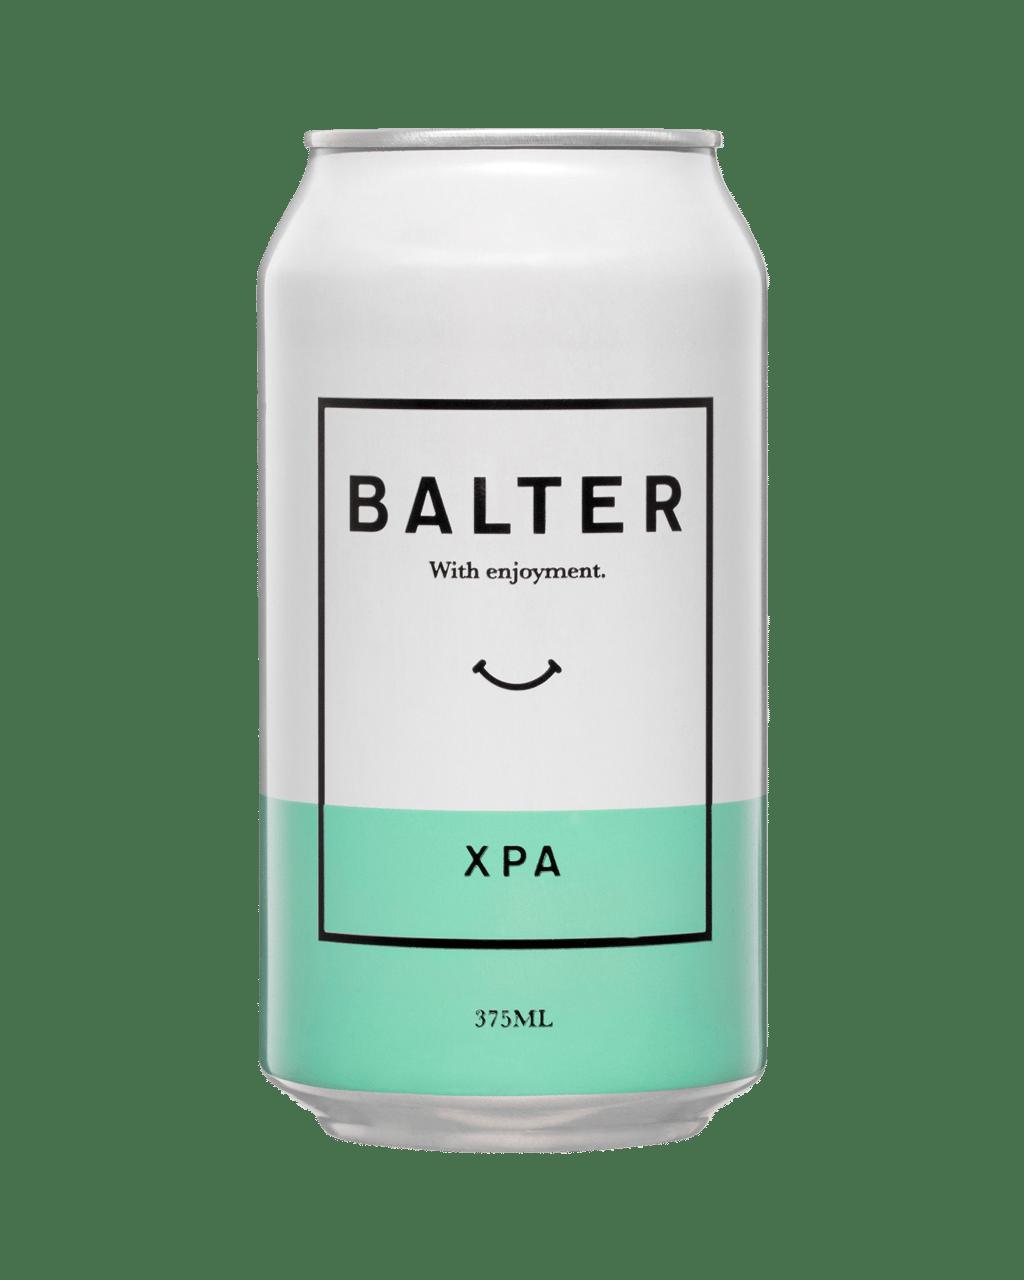 balter xpa cans 375ml dan murphy s buy wine champagne beer